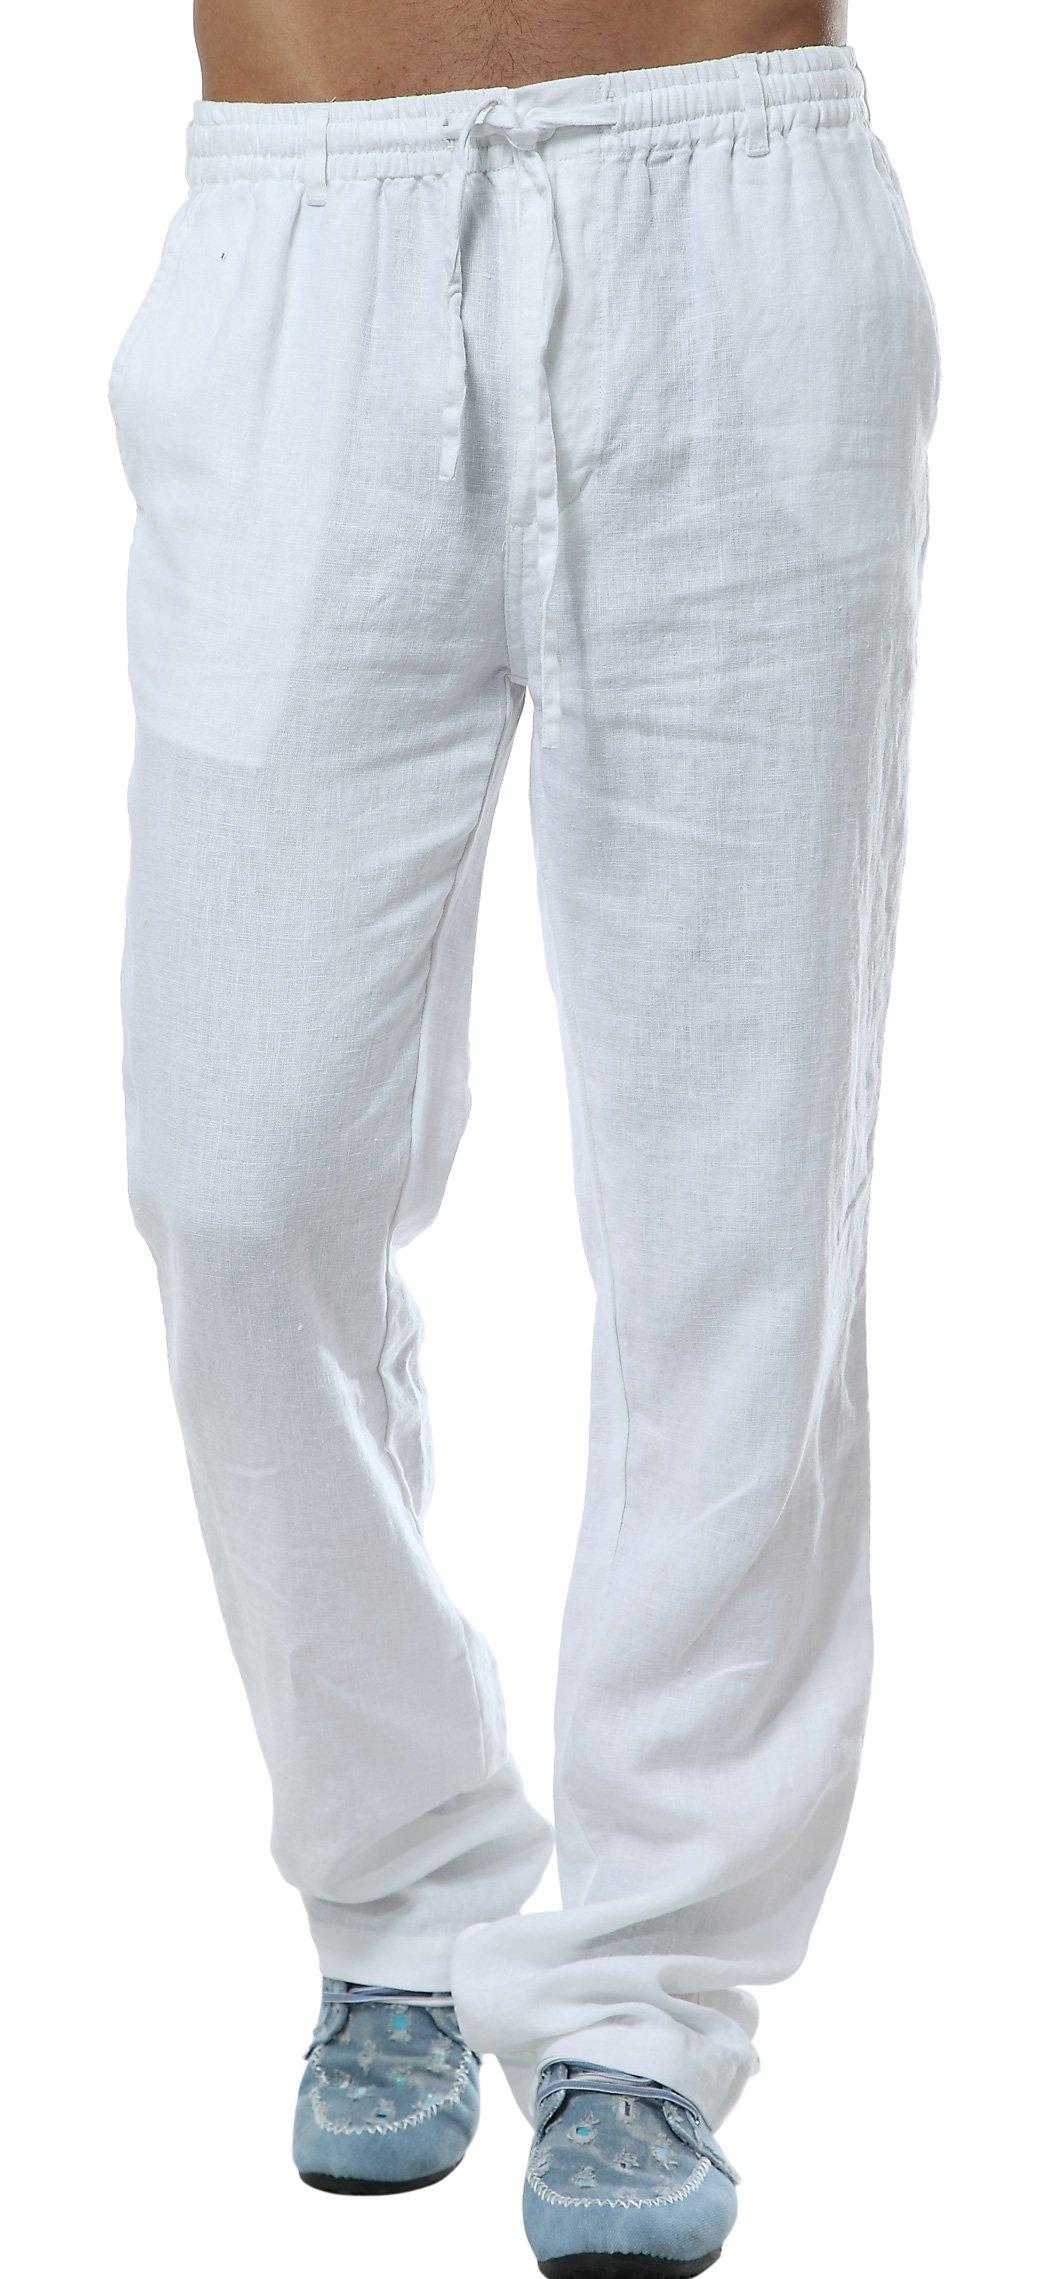 utcoco Men's Mid Waist Straight Leg Linen Thin Pants XX-Large Light Blue